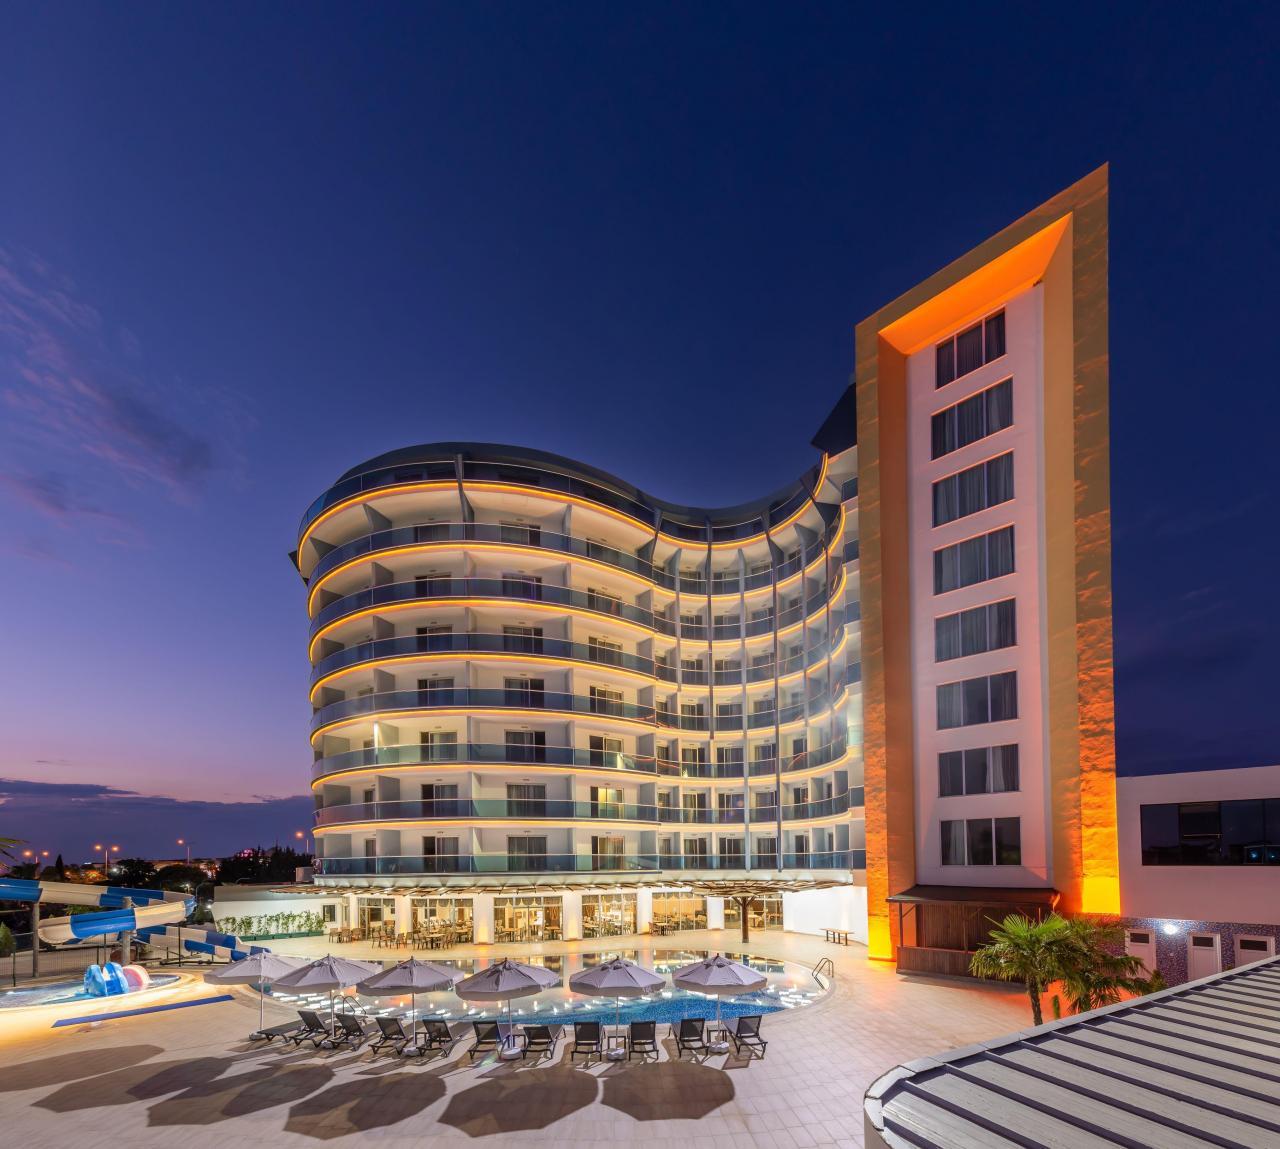 The Marilis Hill Resort